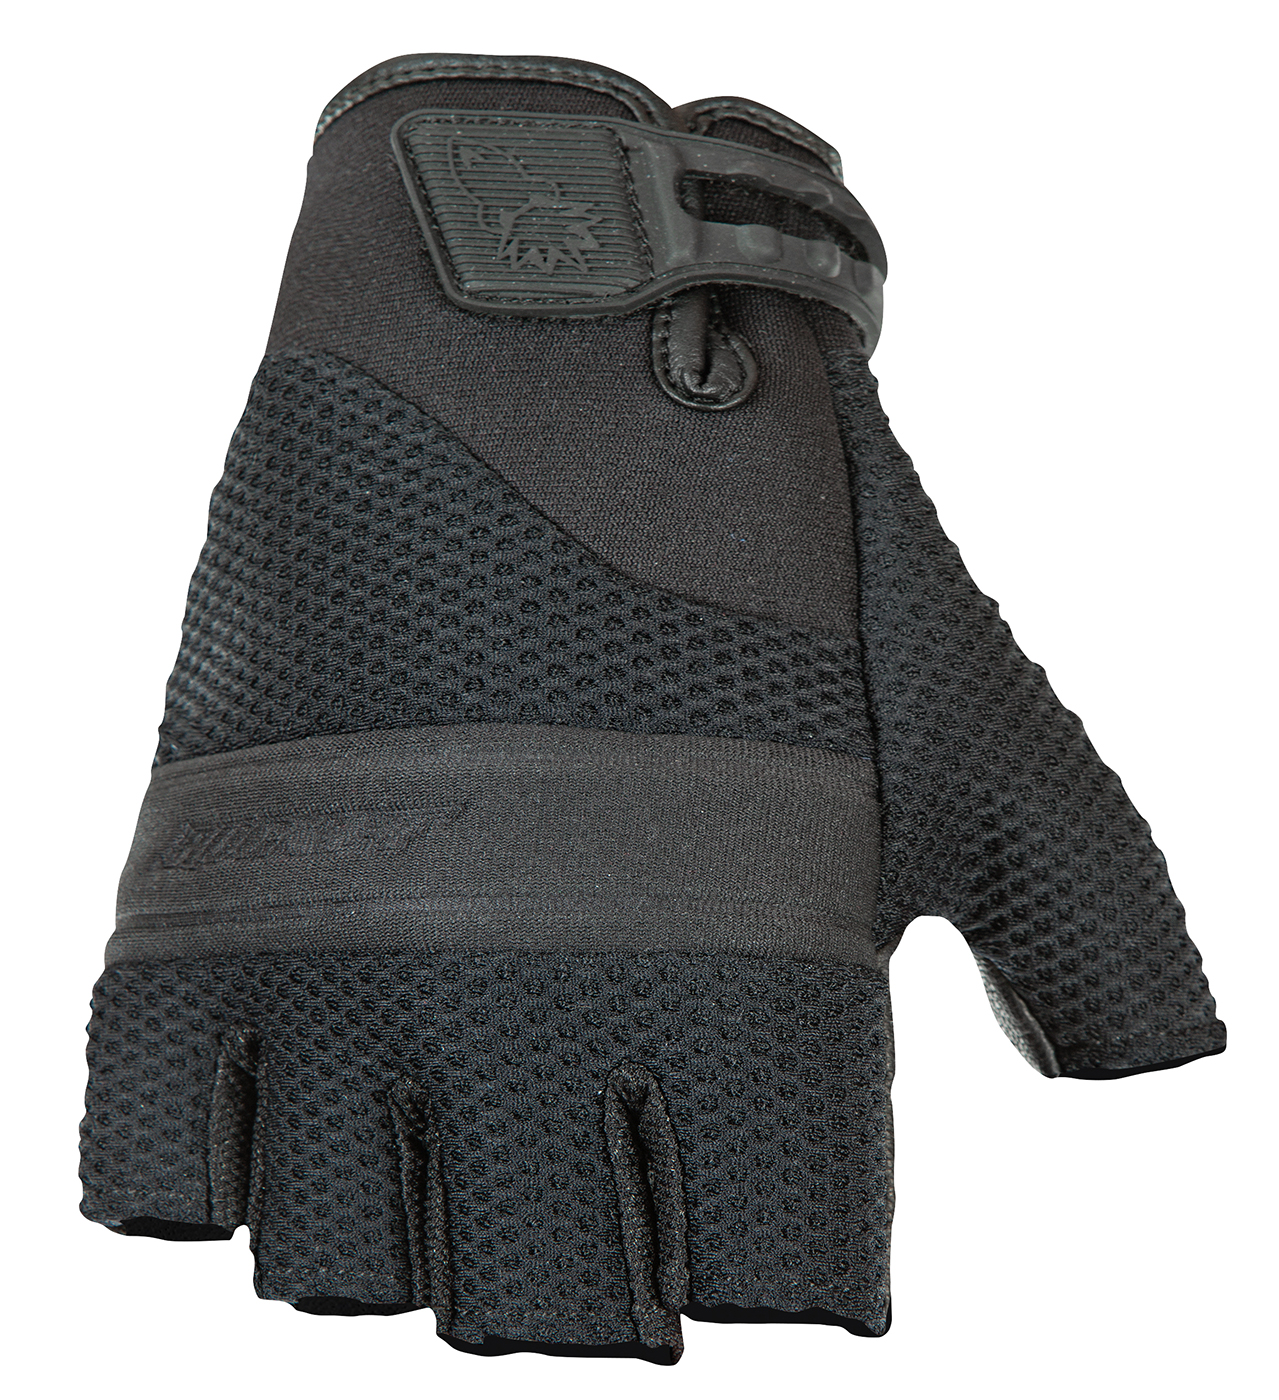 Joe Rocket Vento Fingerless Glove Gloves Black